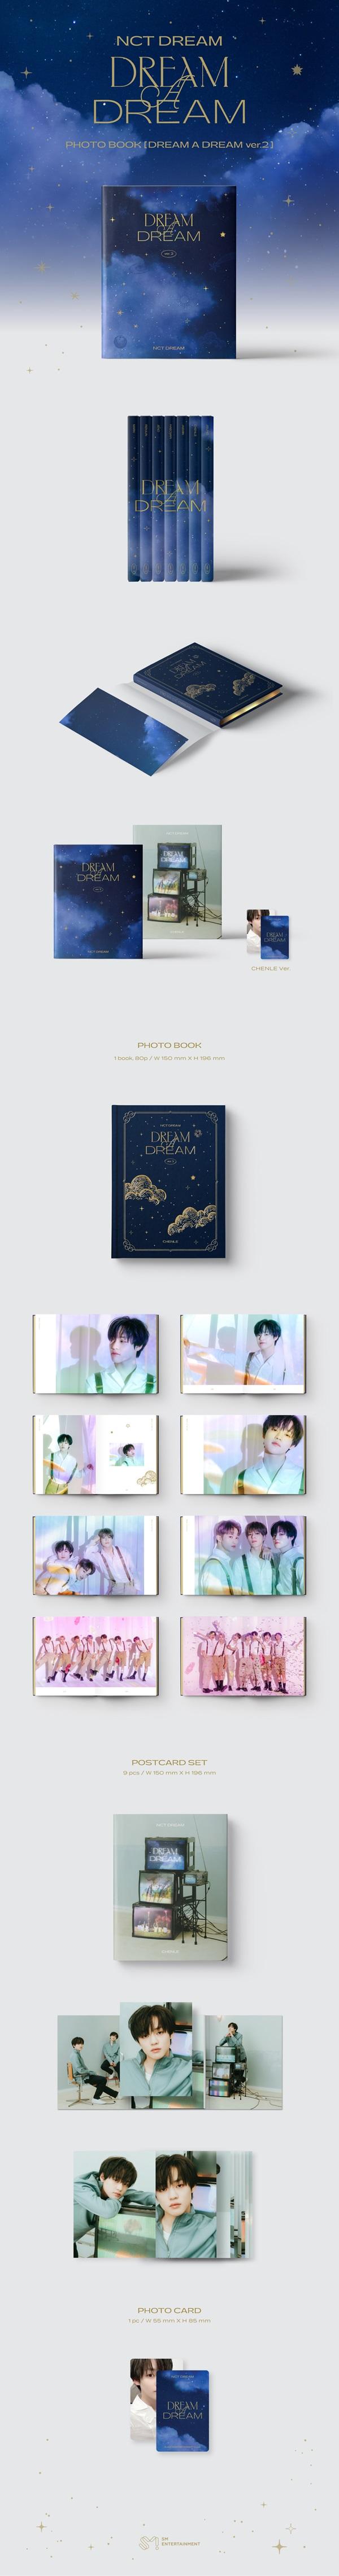 NCT DREAM PHOTO BOOK [DREAM A DREAM ver.2]: CHENLE Ver.